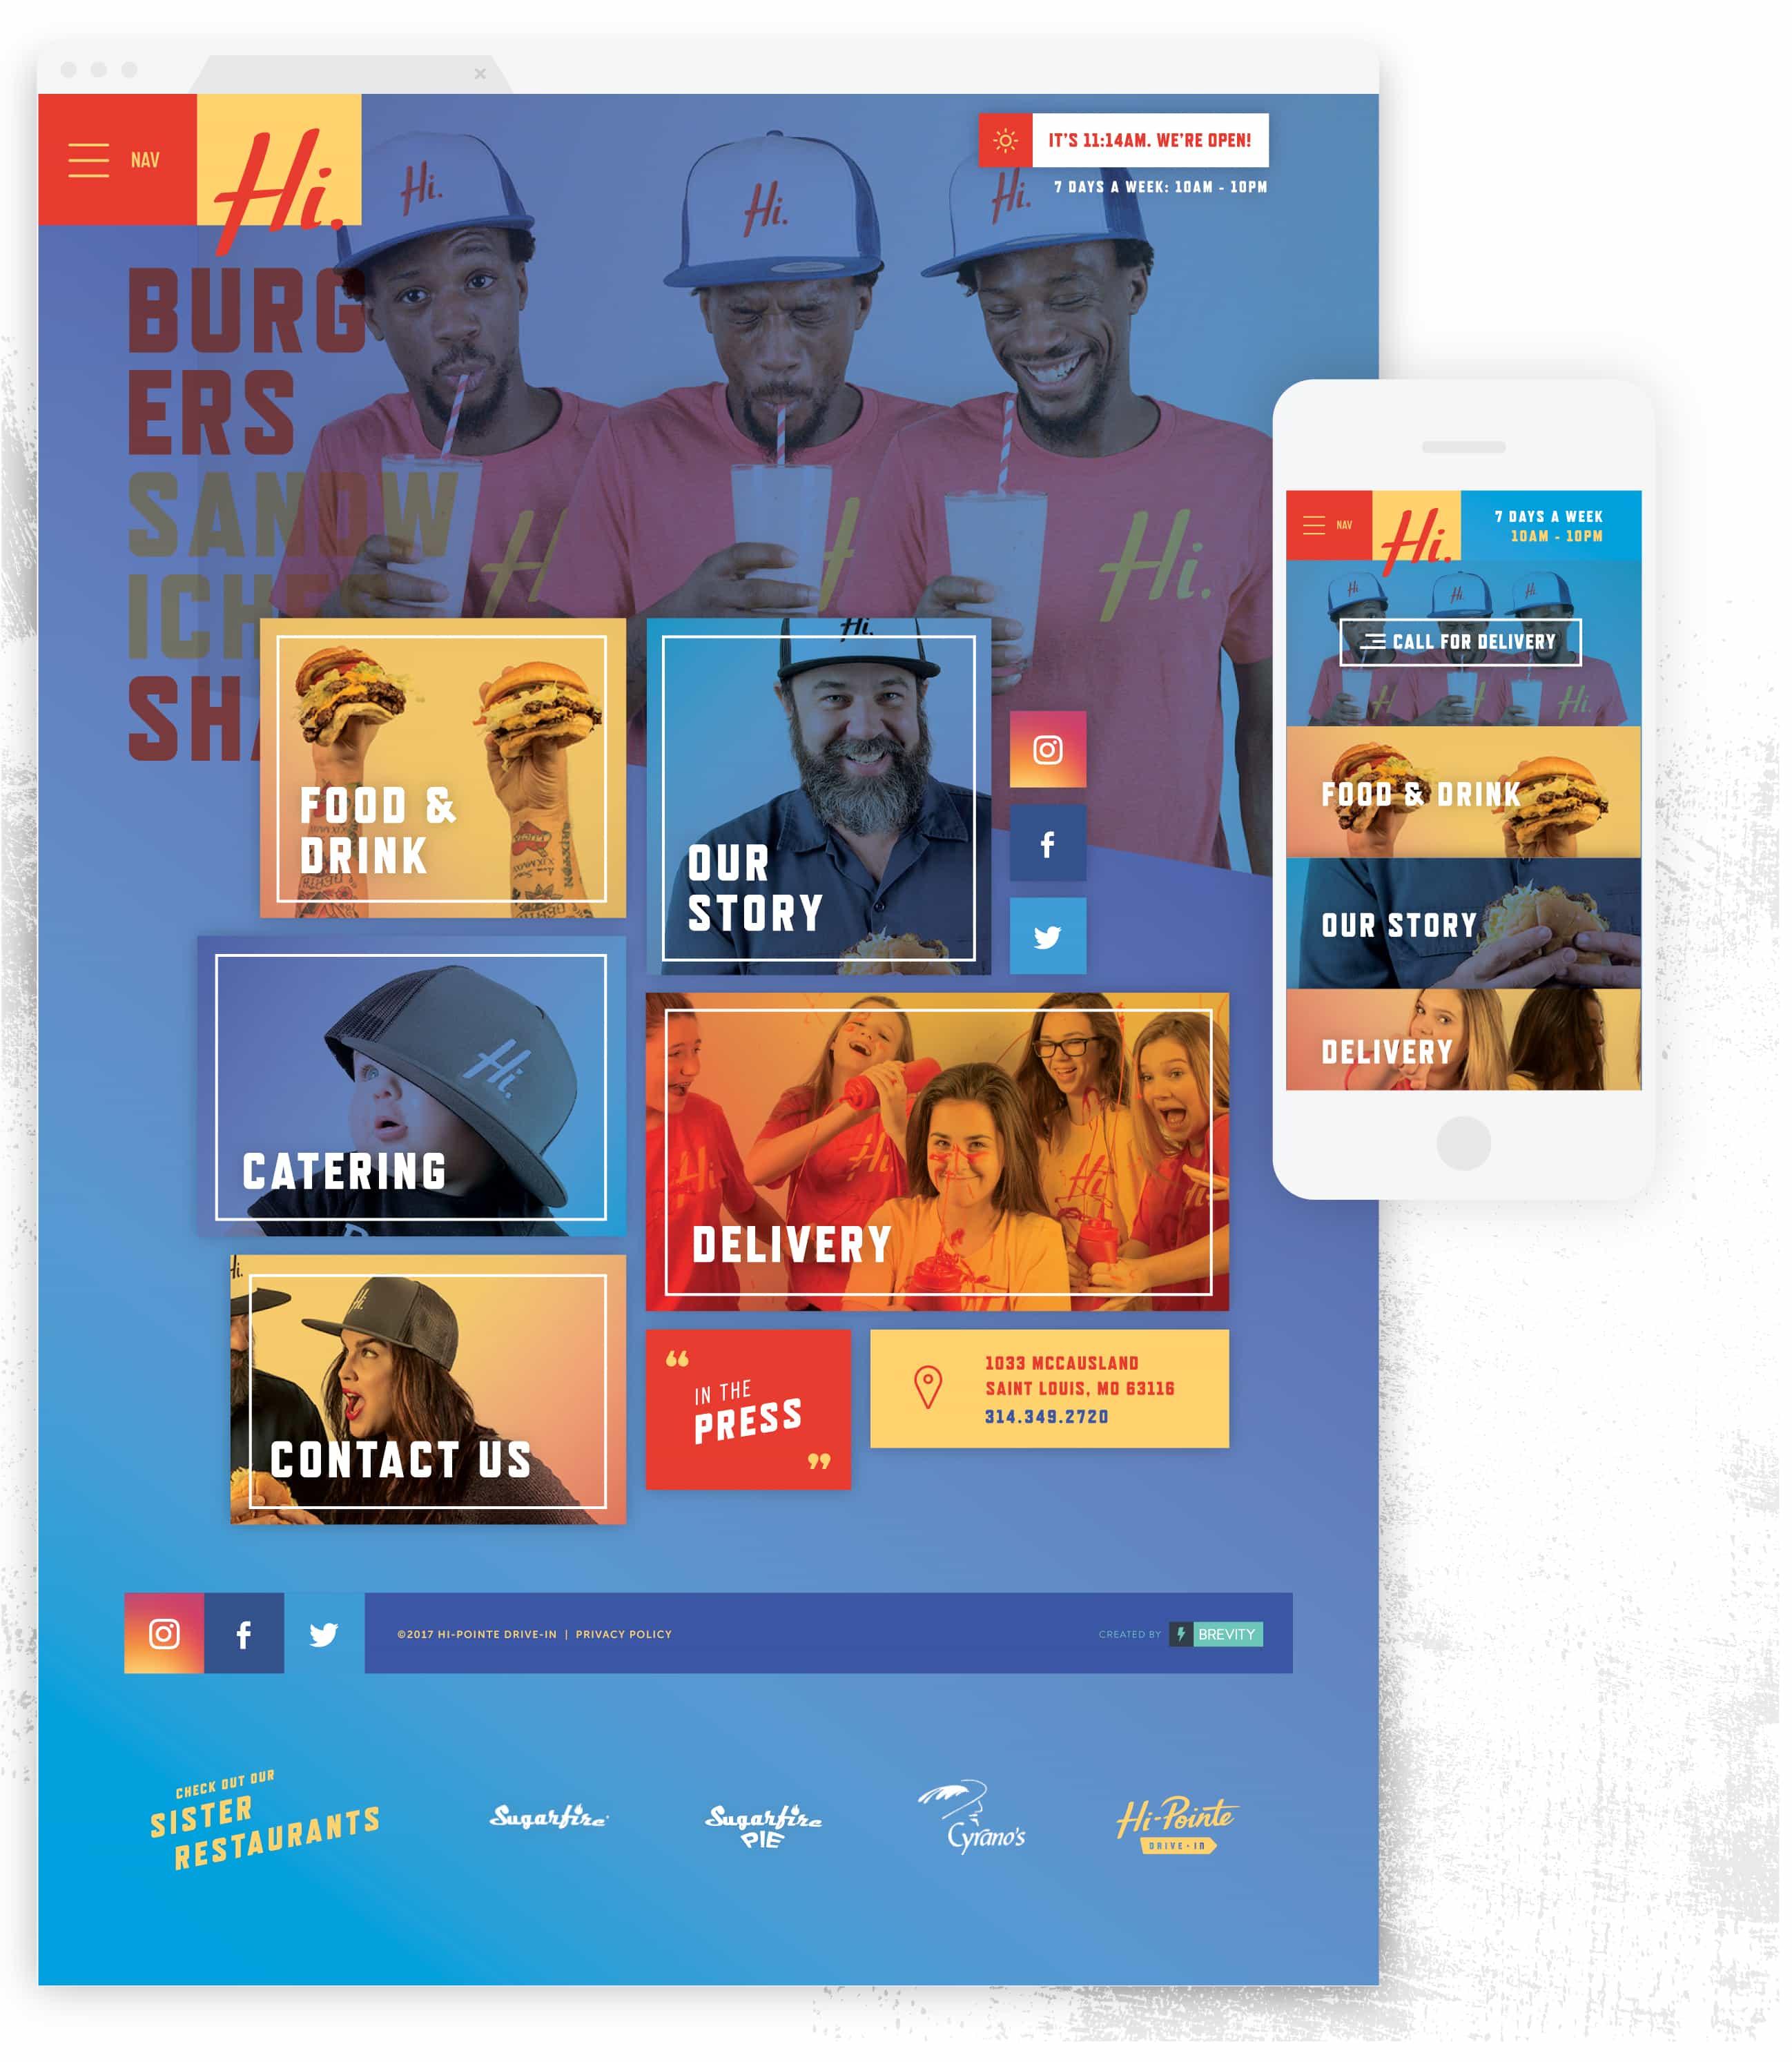 Mobile Web Design – Restaurant Digital Marketing